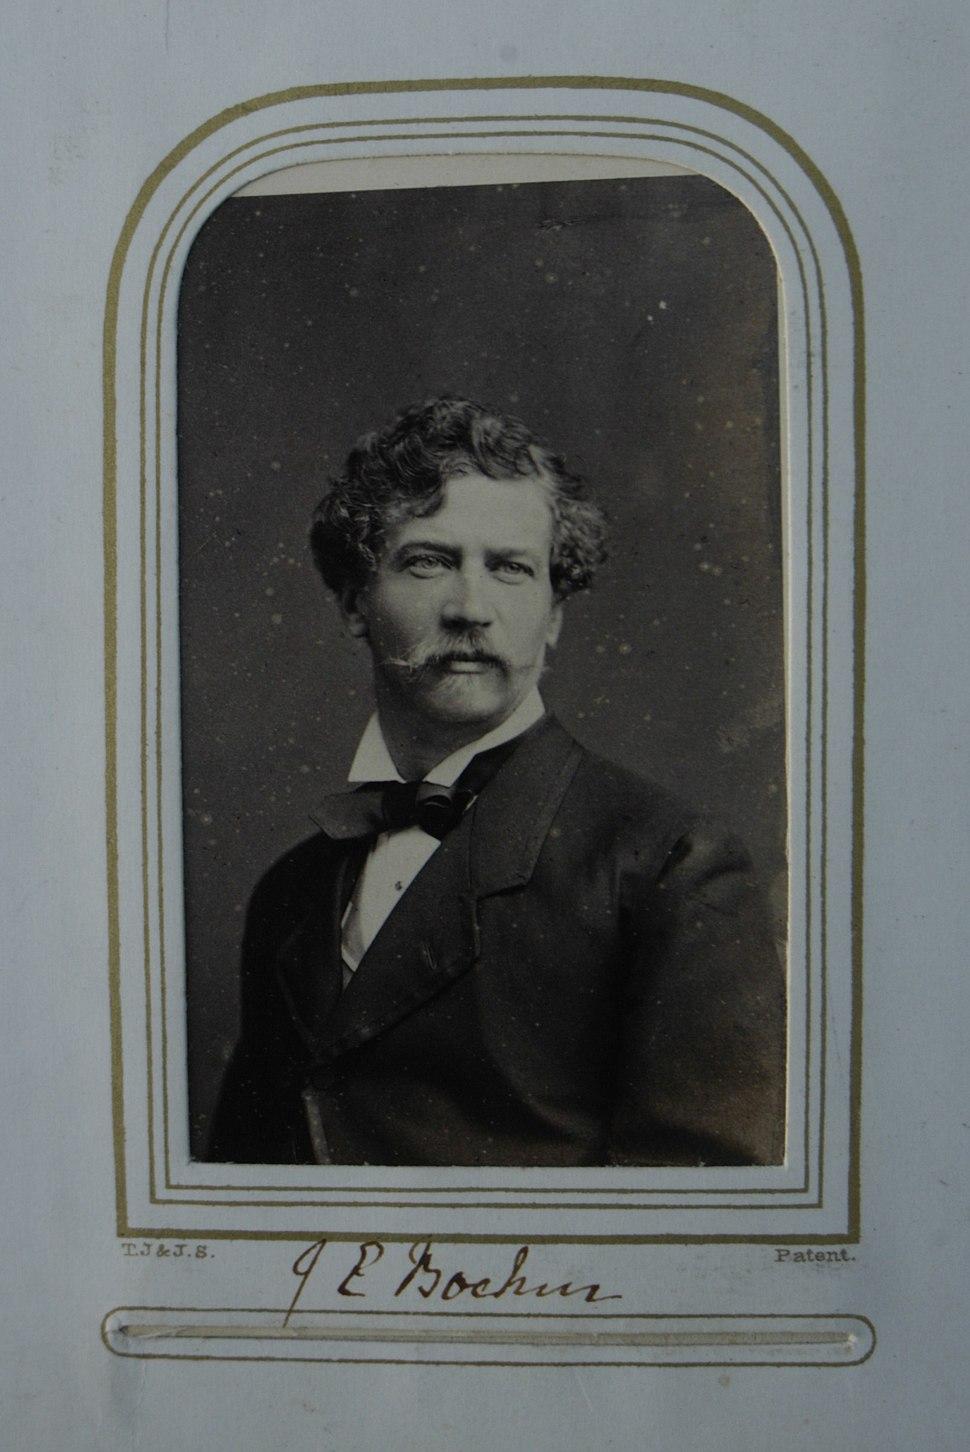 Carte de Visite of Joseph Edgar Boehm, 1860s